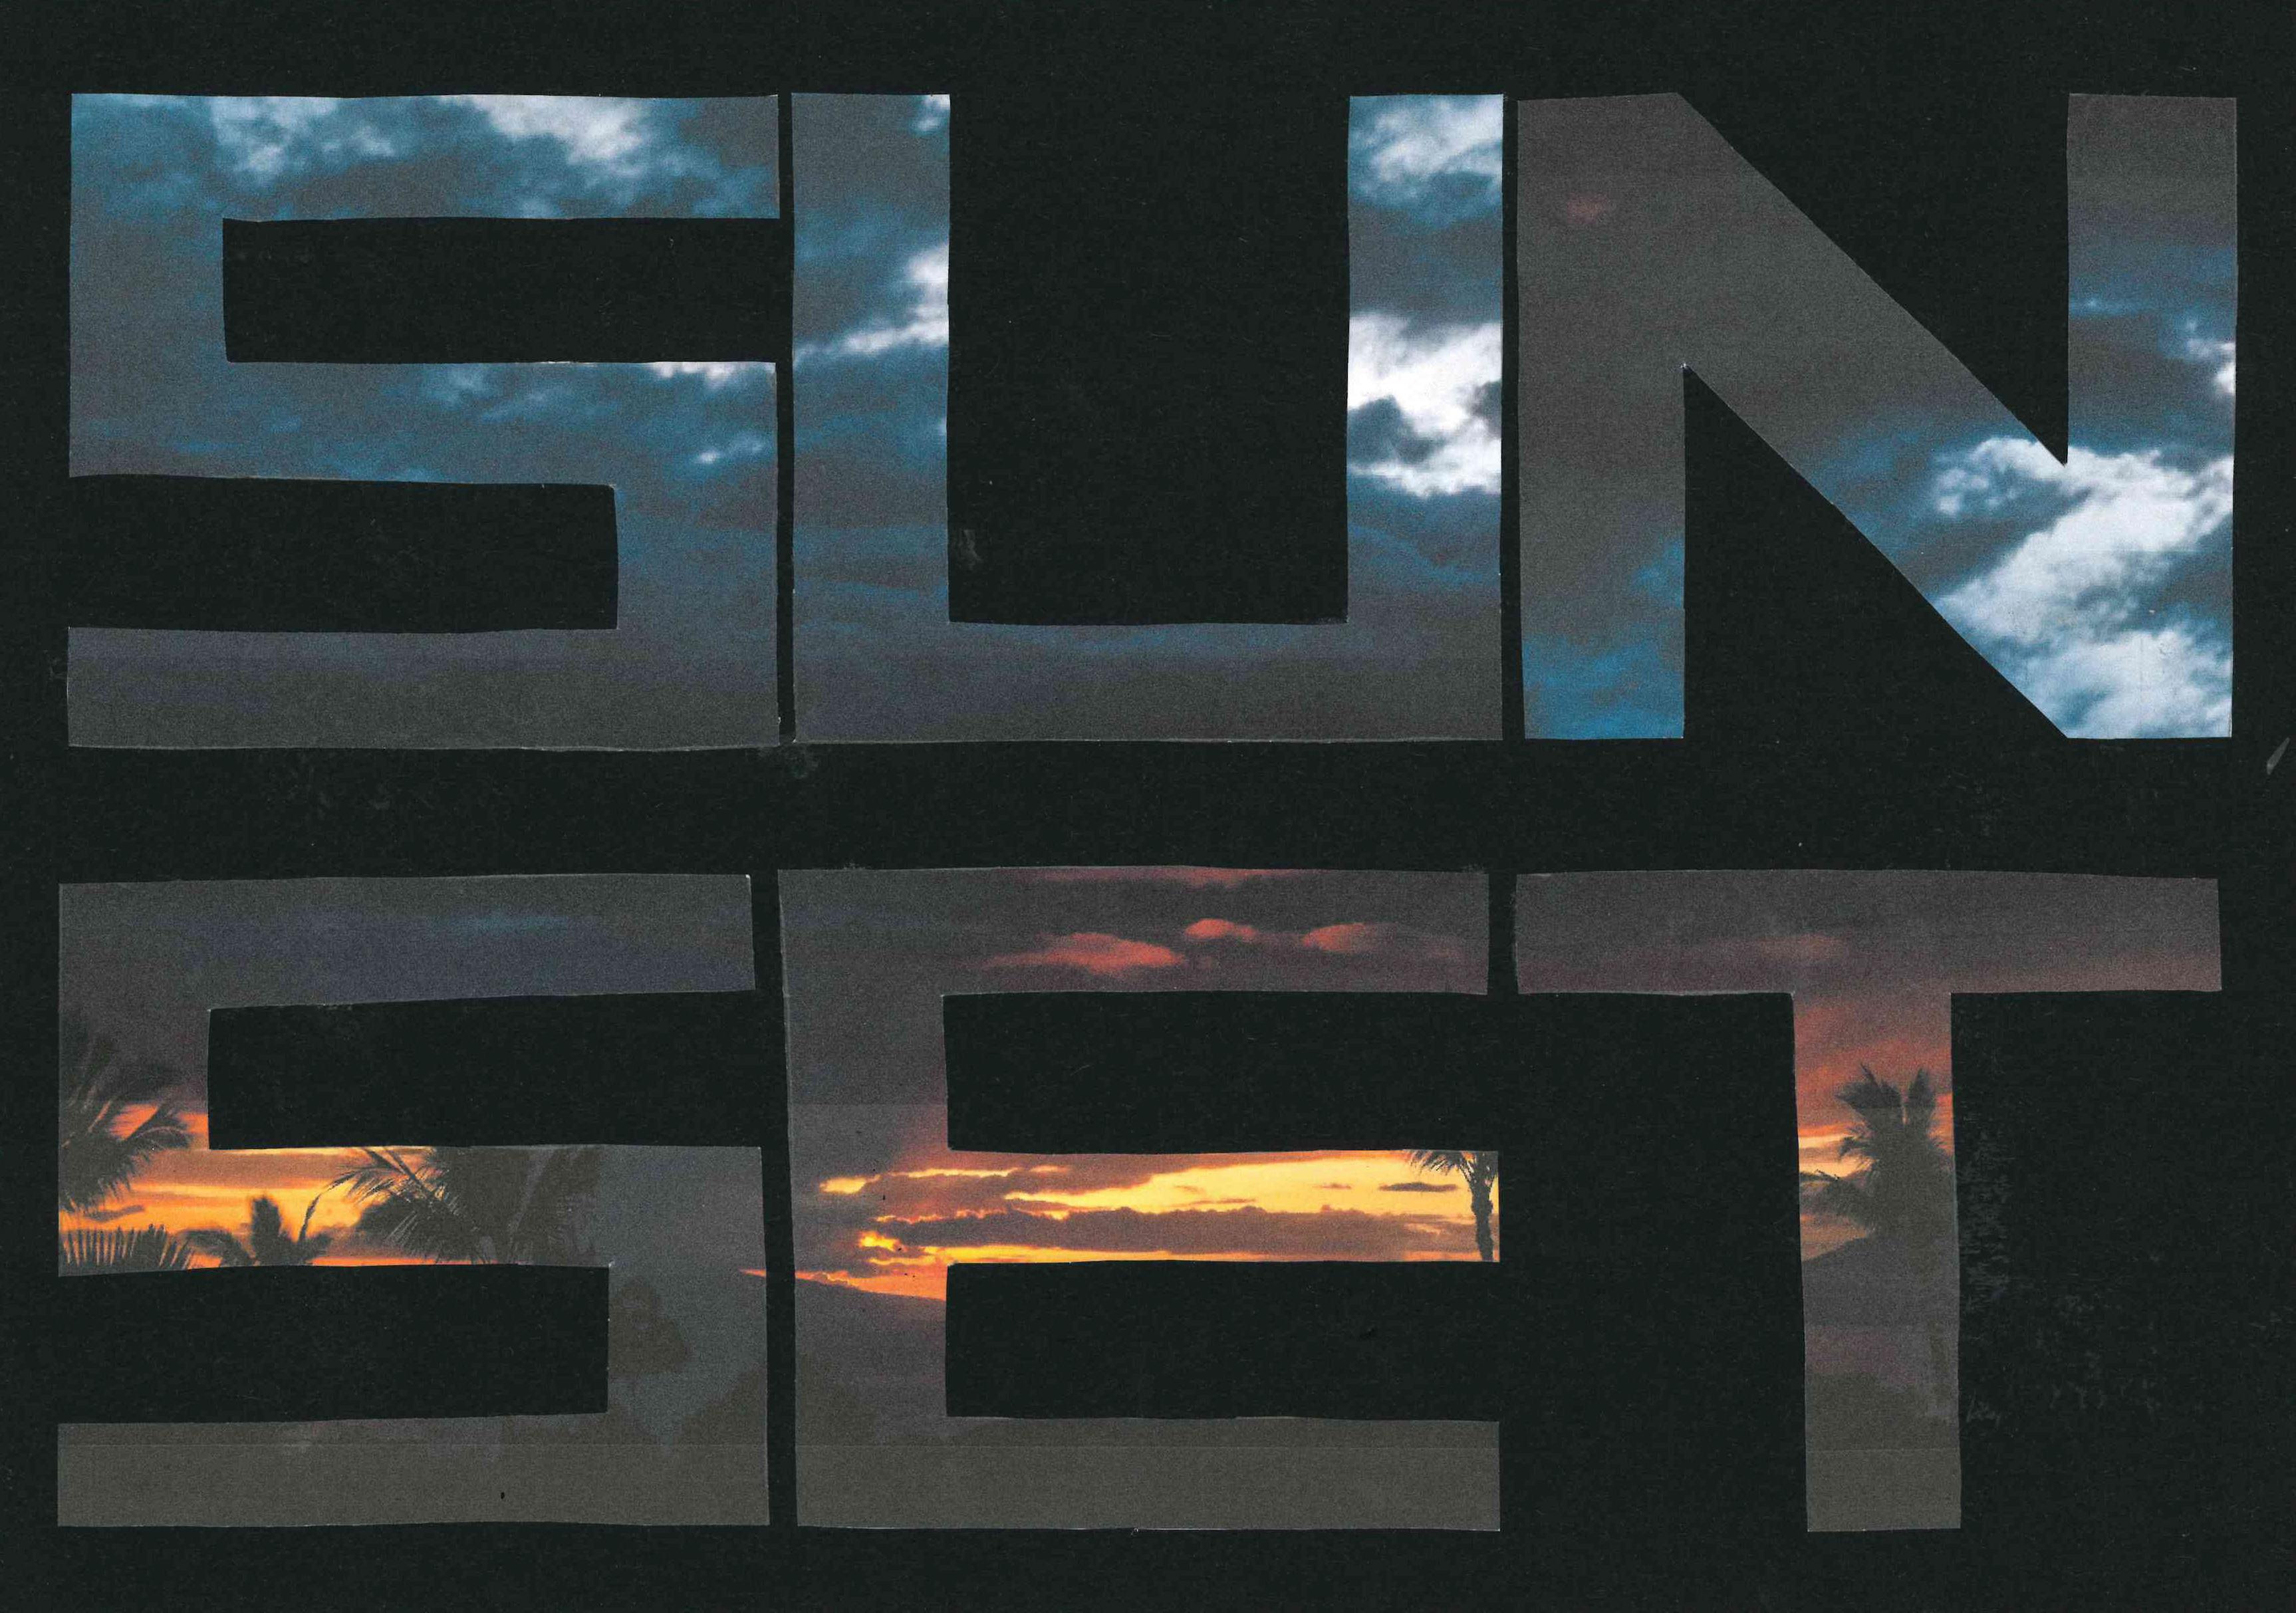 Fotobuchstaben5.jpg